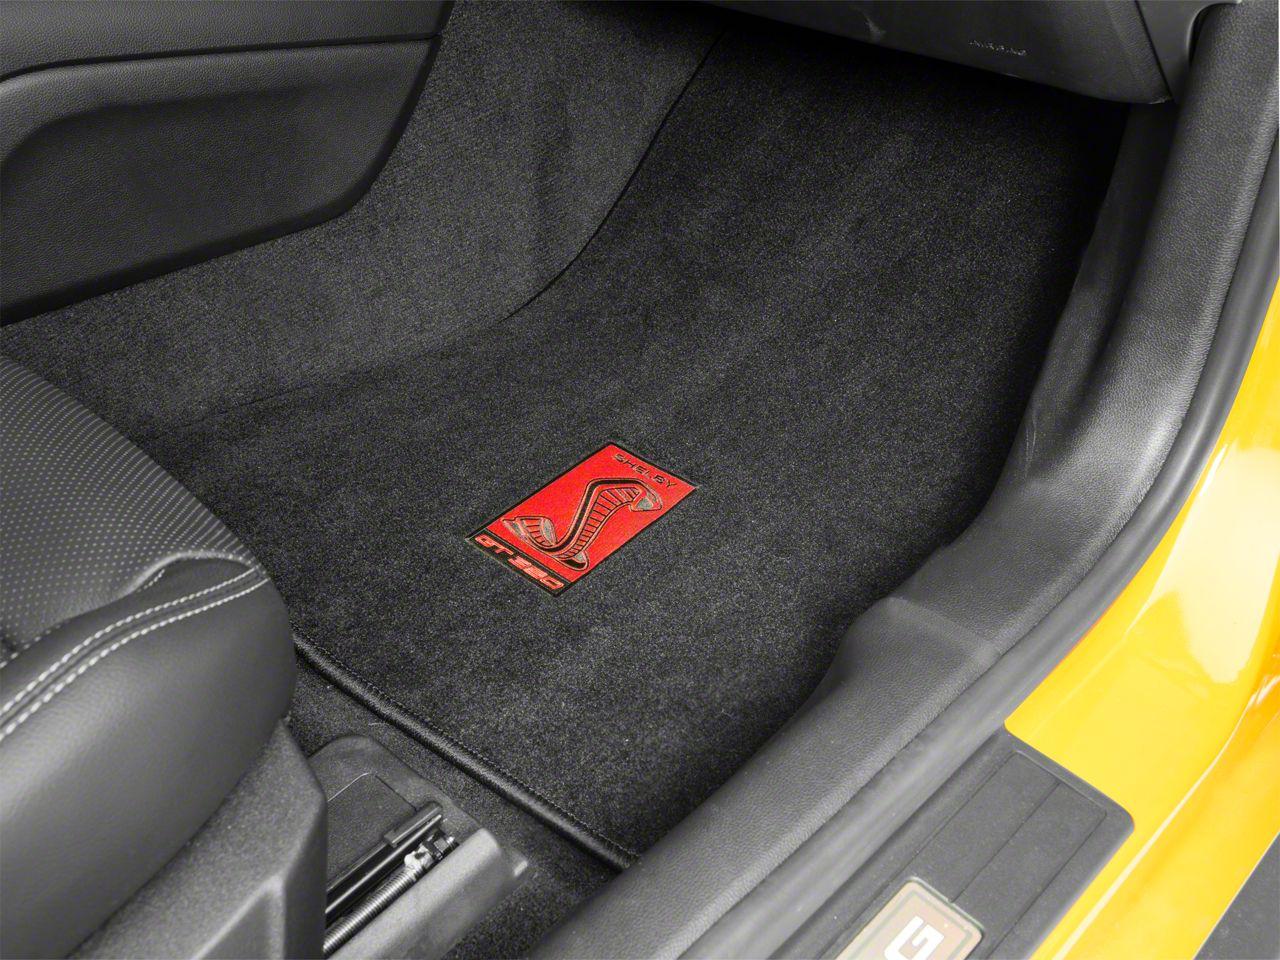 Lloyd Front & Rear Floor Mats w/ Shelby GT350R Badge - Black (15-19 All)